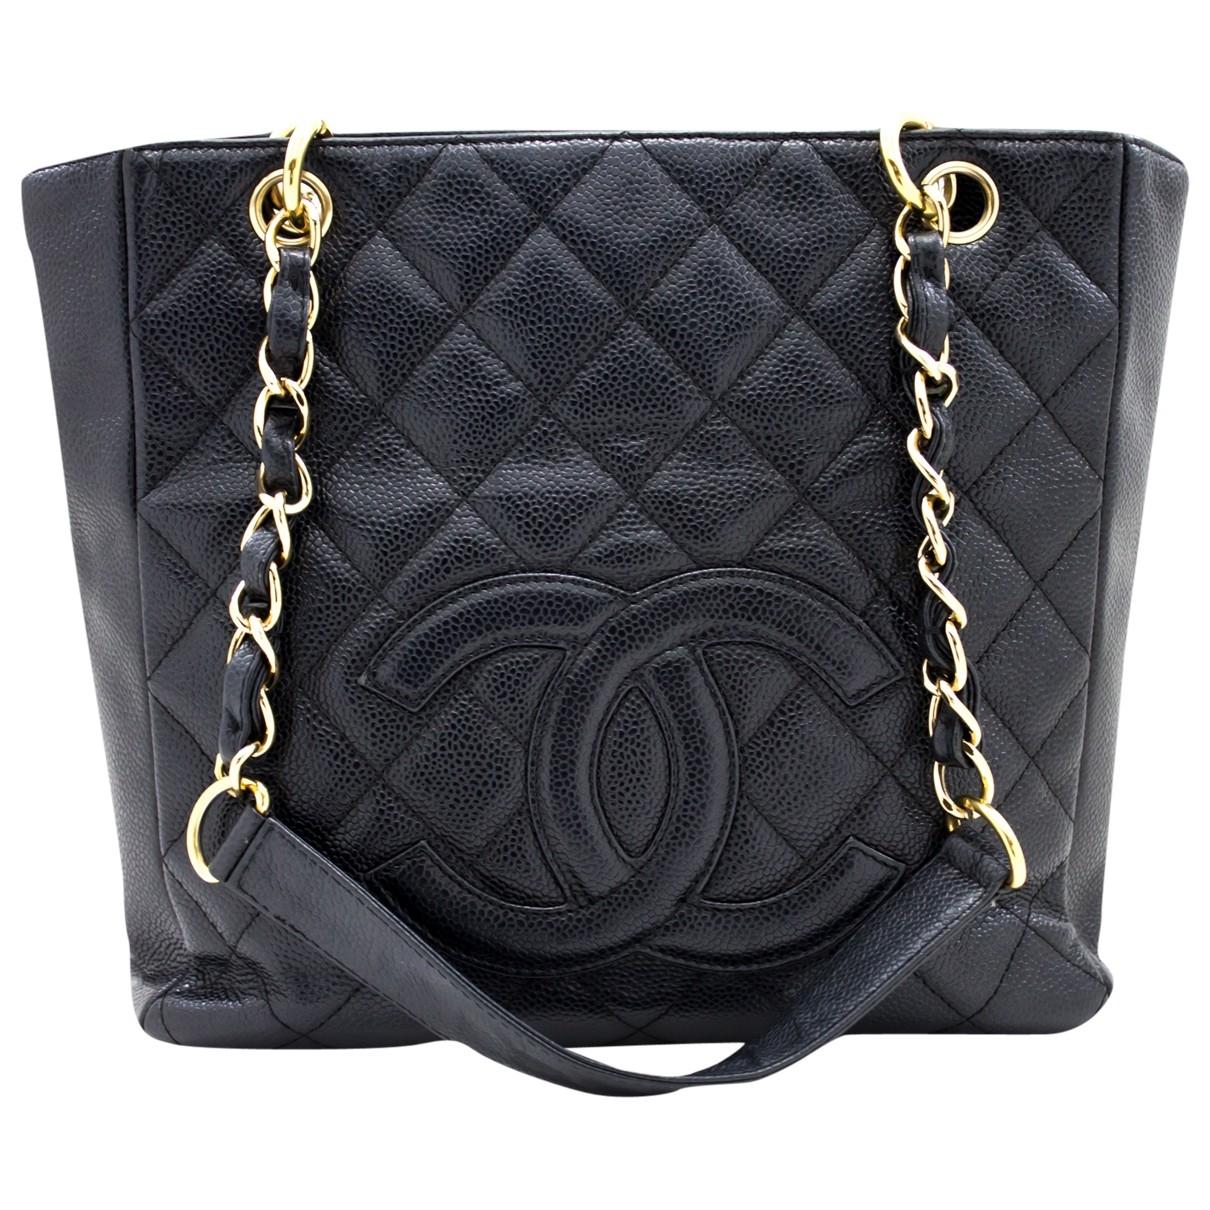 Chanel Petite Shopping Tote Handtasche in  Schwarz Leder